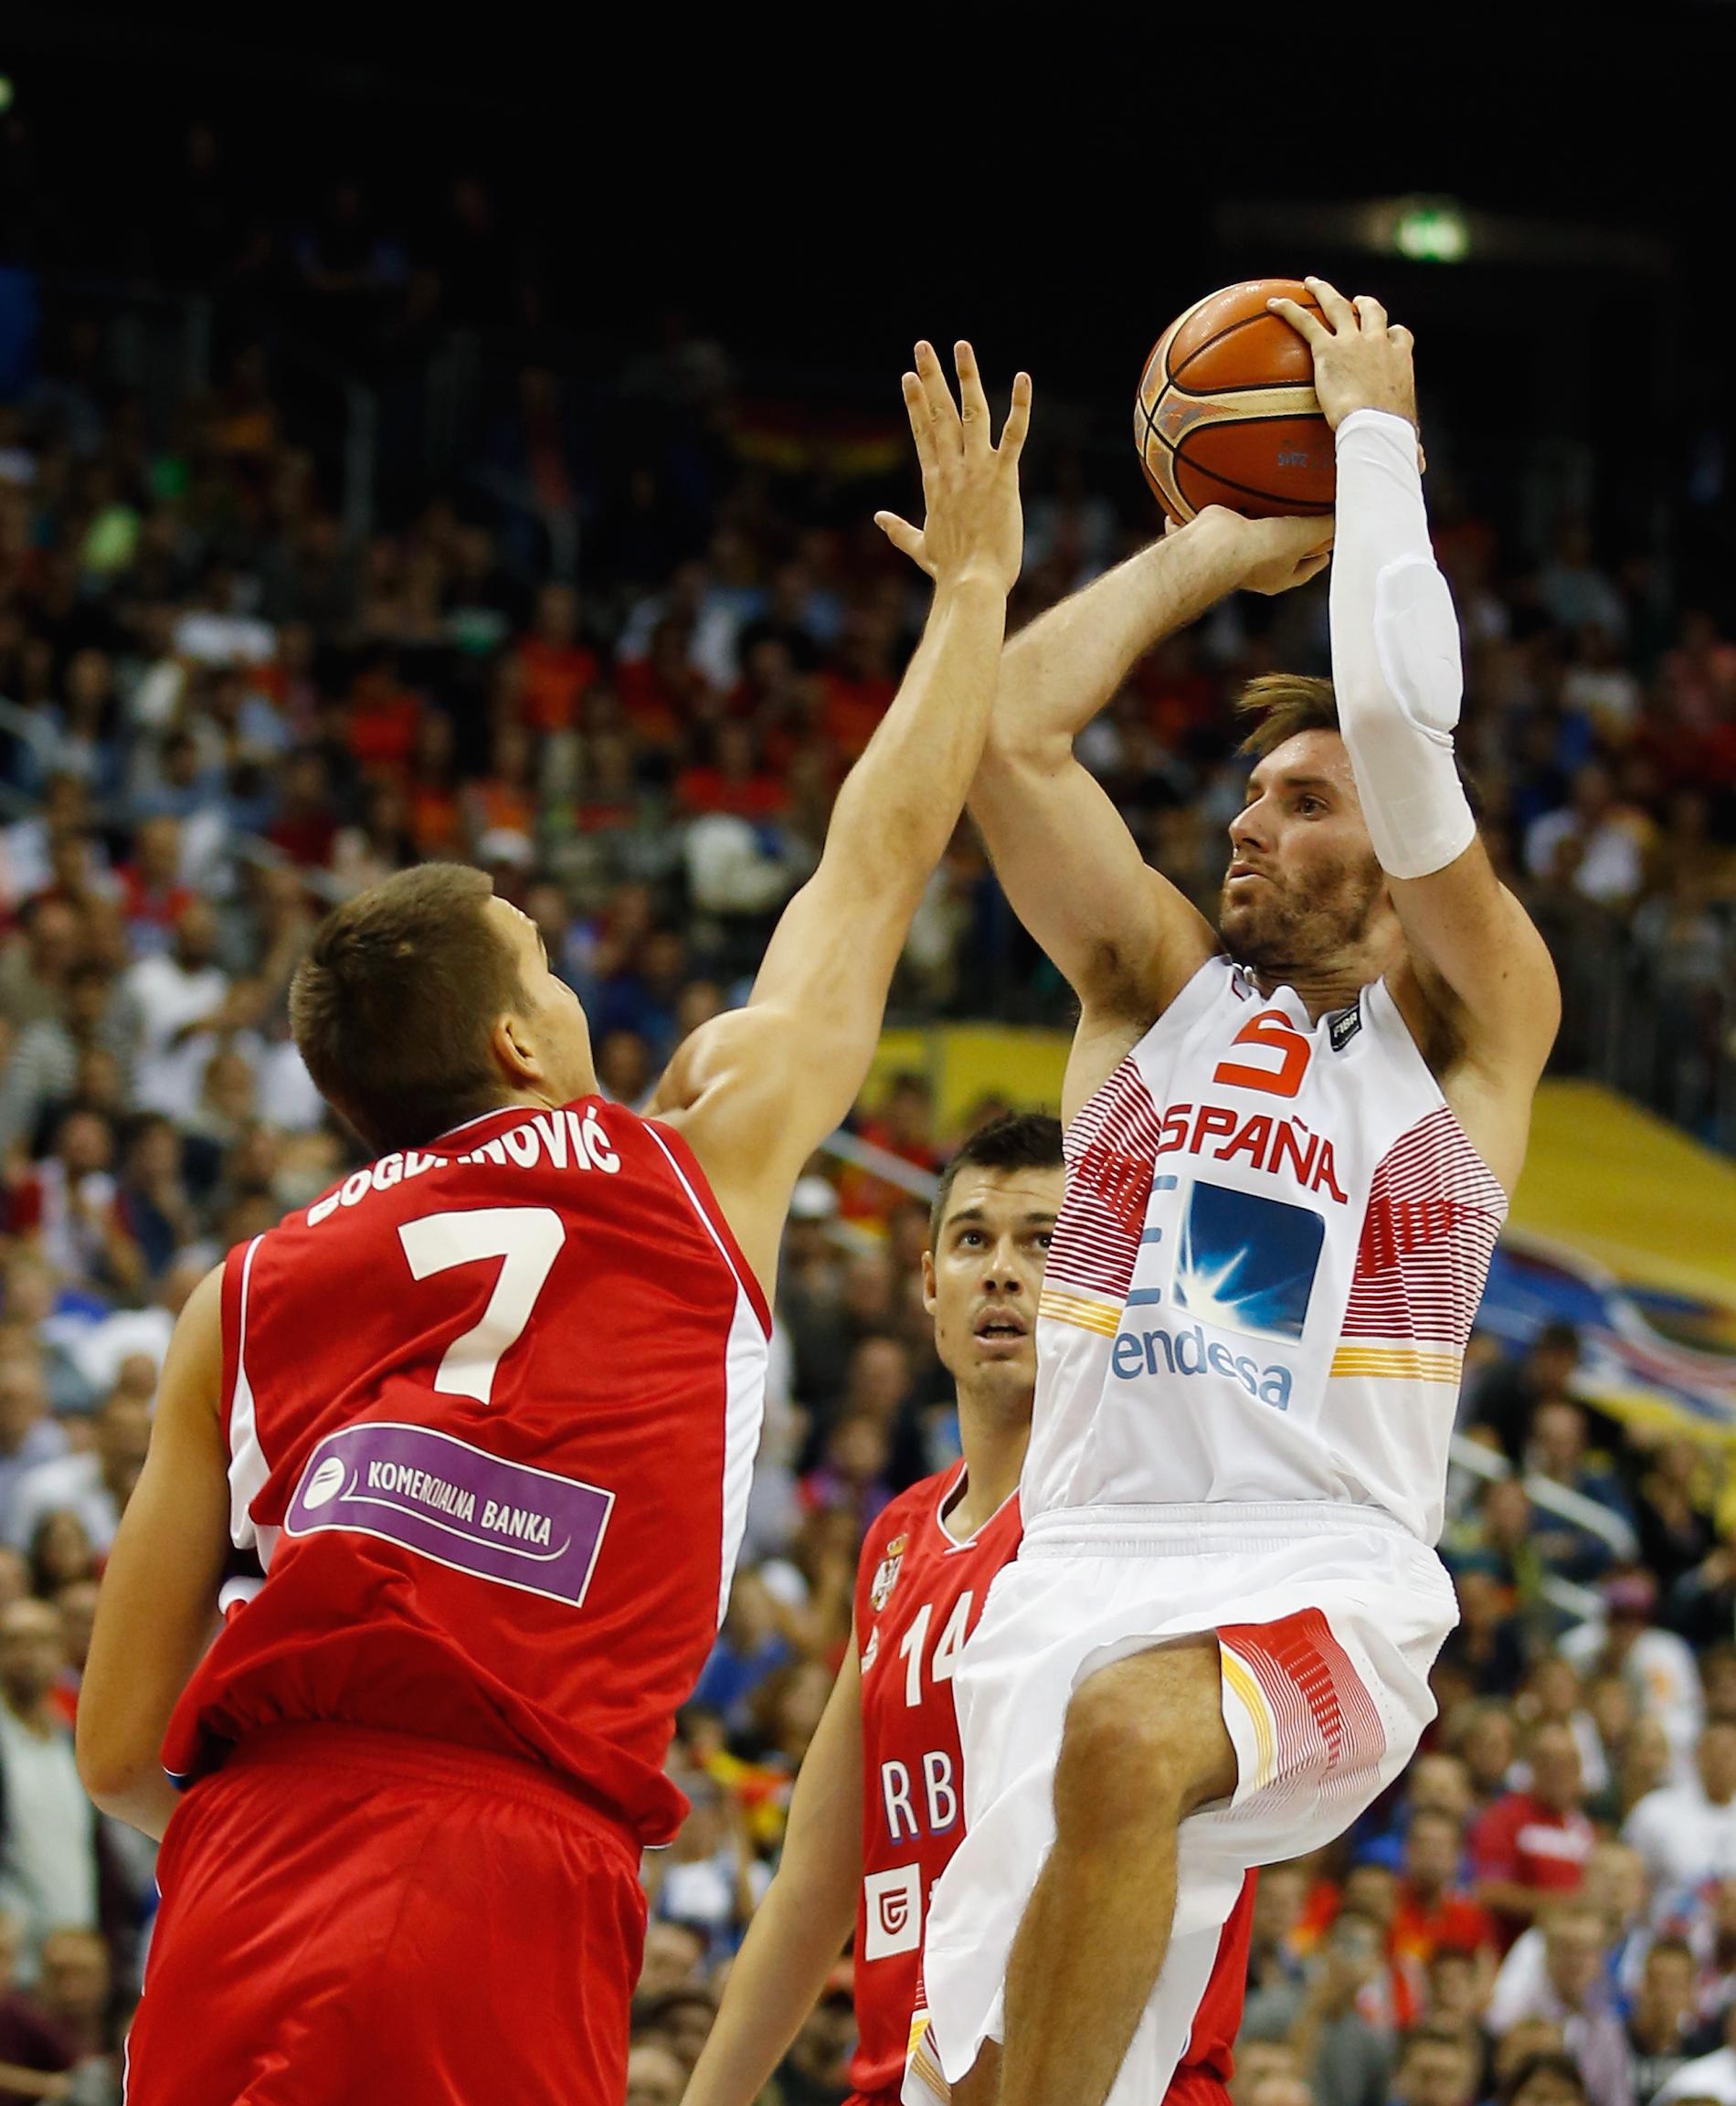 Spain v Serbia - FIBA Eurobasket 2015